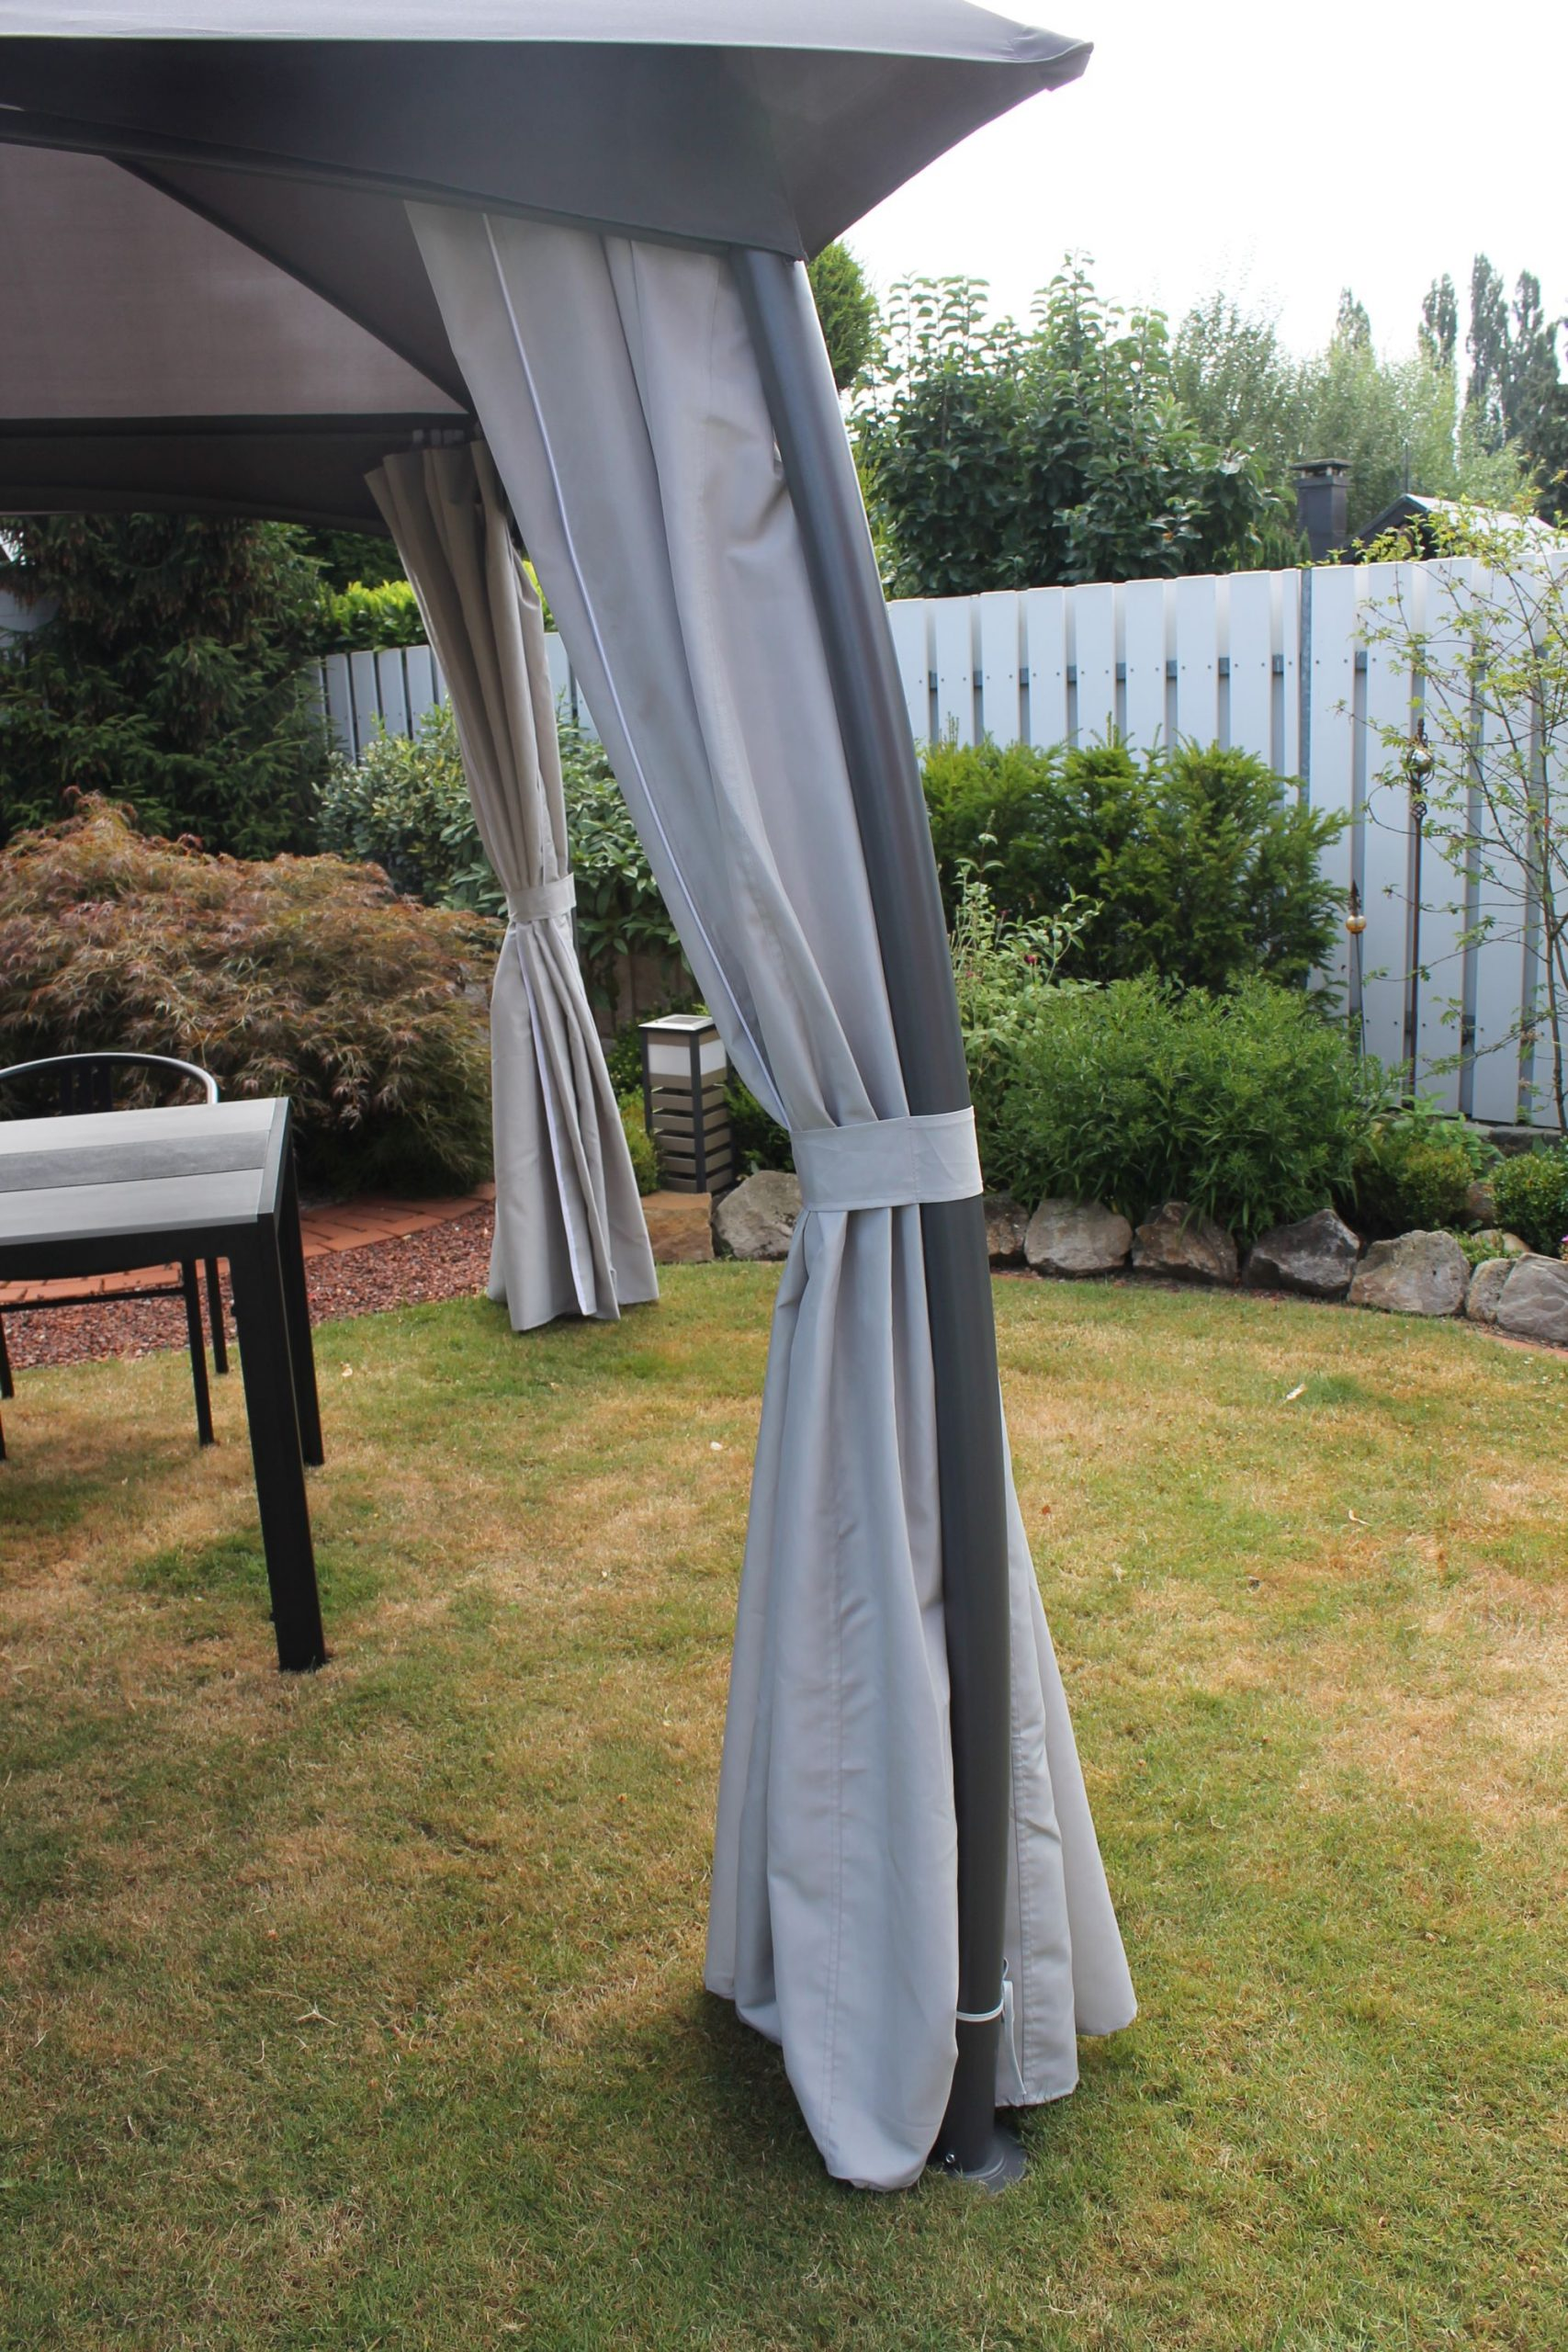 Full Size of Gartenüberdachung Leco Pavillon Milena Dach Pergola Terrasse Garten Berdachung Garten Gartenüberdachung